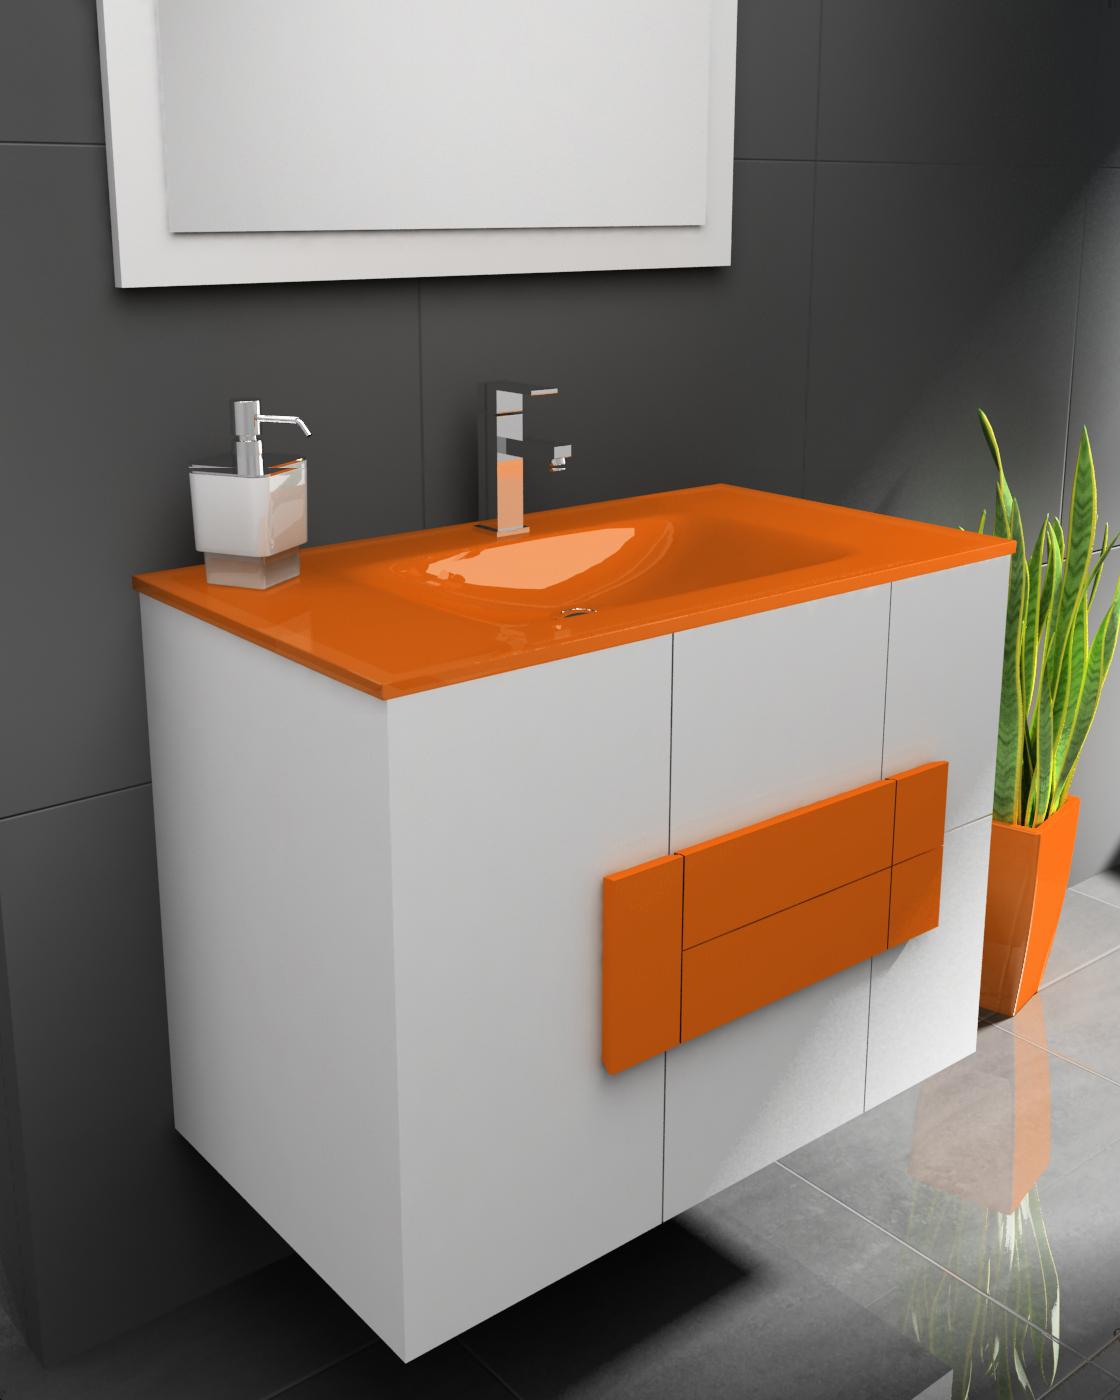 Muebles baño lavabo cristal : Mueble ? muebles de ba?o naranja galer?a fotos